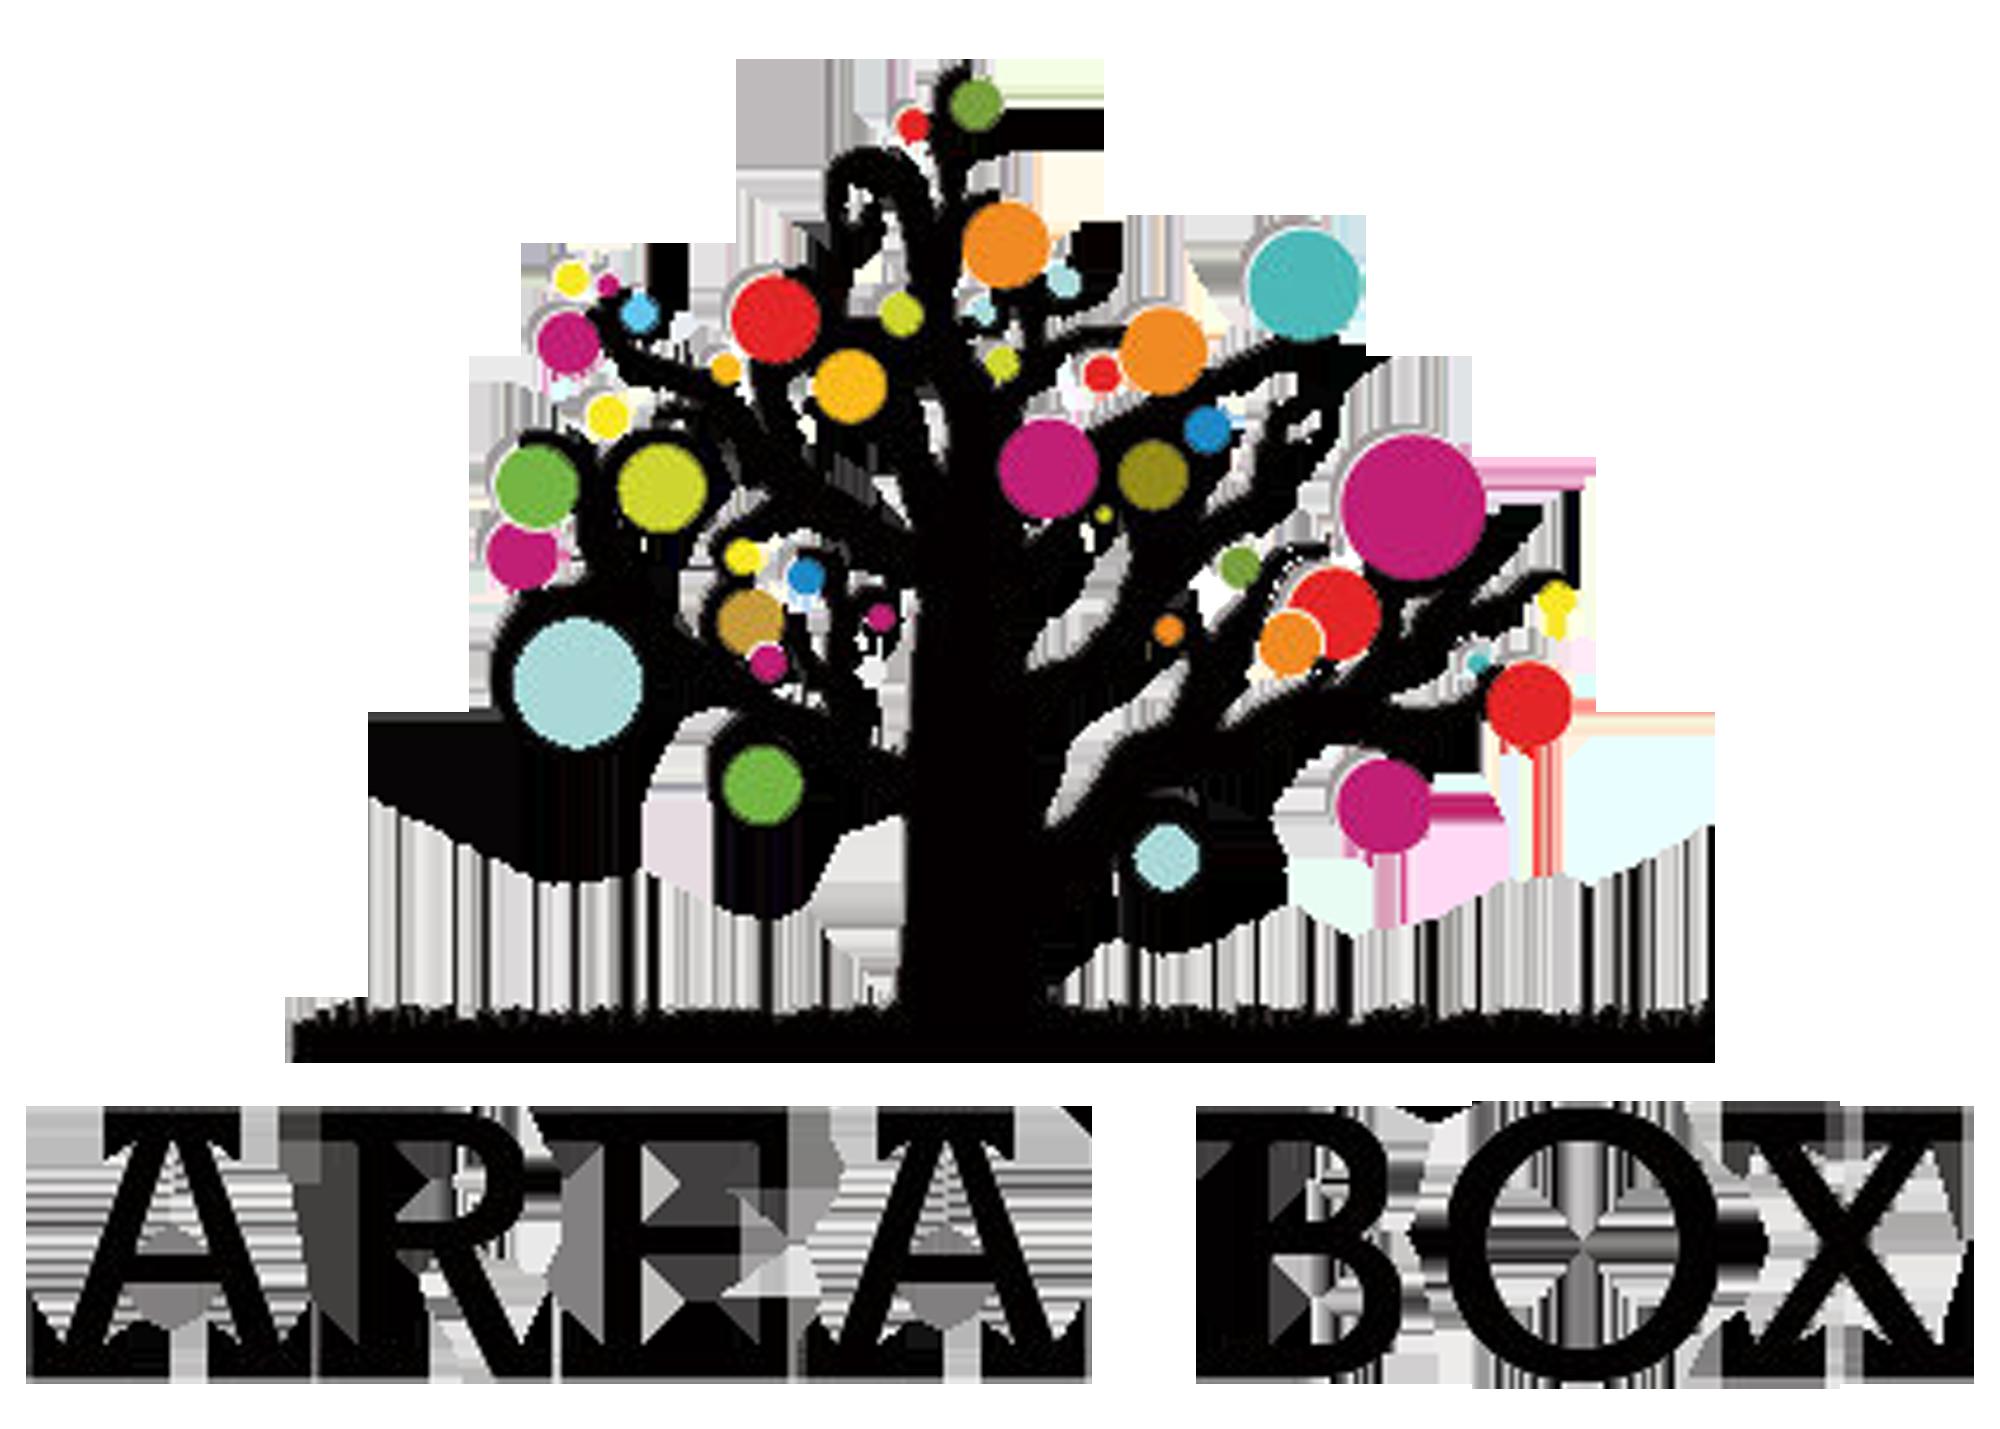 areabox